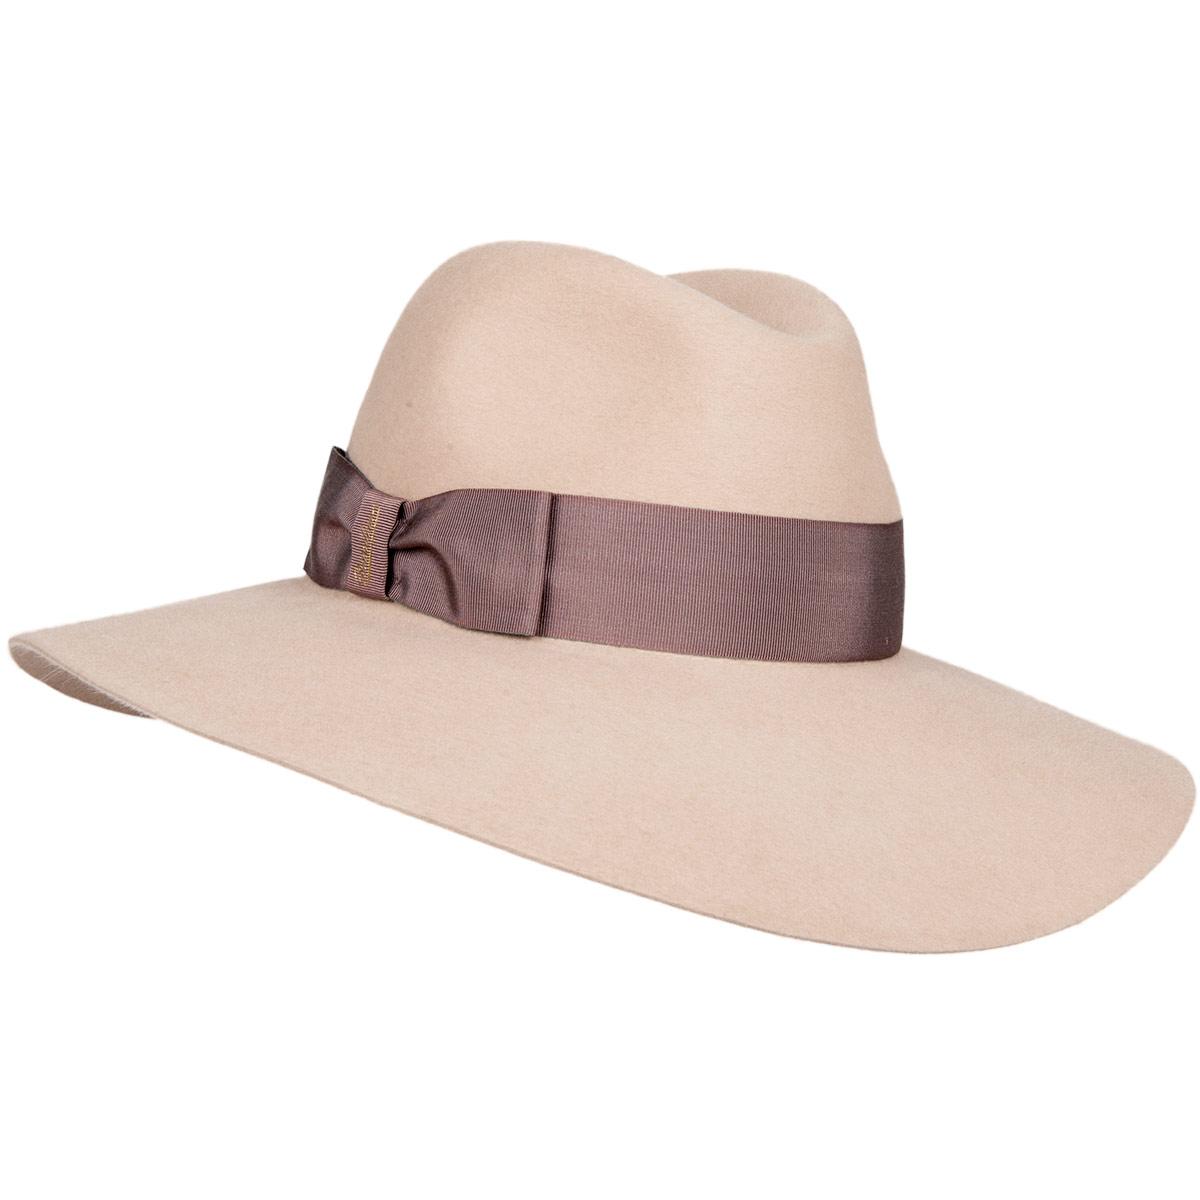 cappello con tesa larga Sophie firmato BORSALINO ... cef8b2556689